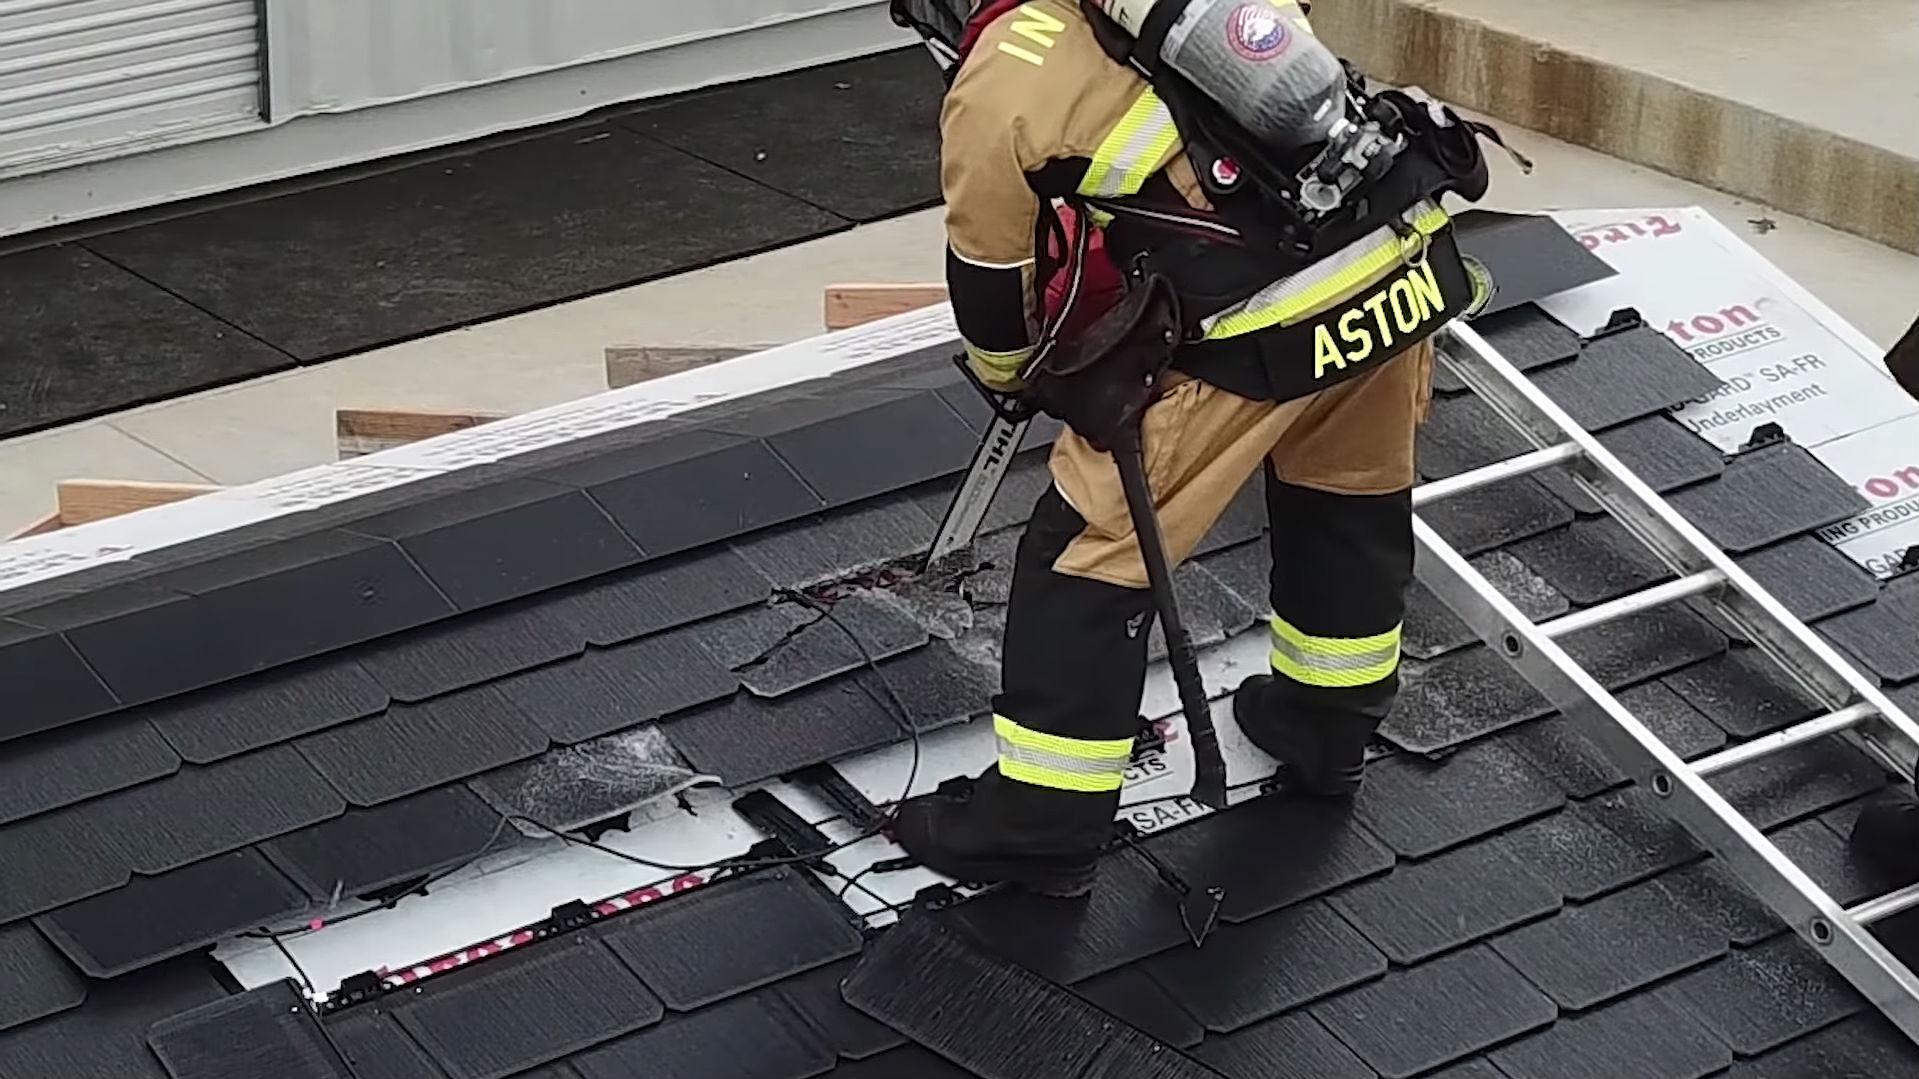 tesla-solar-roof-emergency-response-1